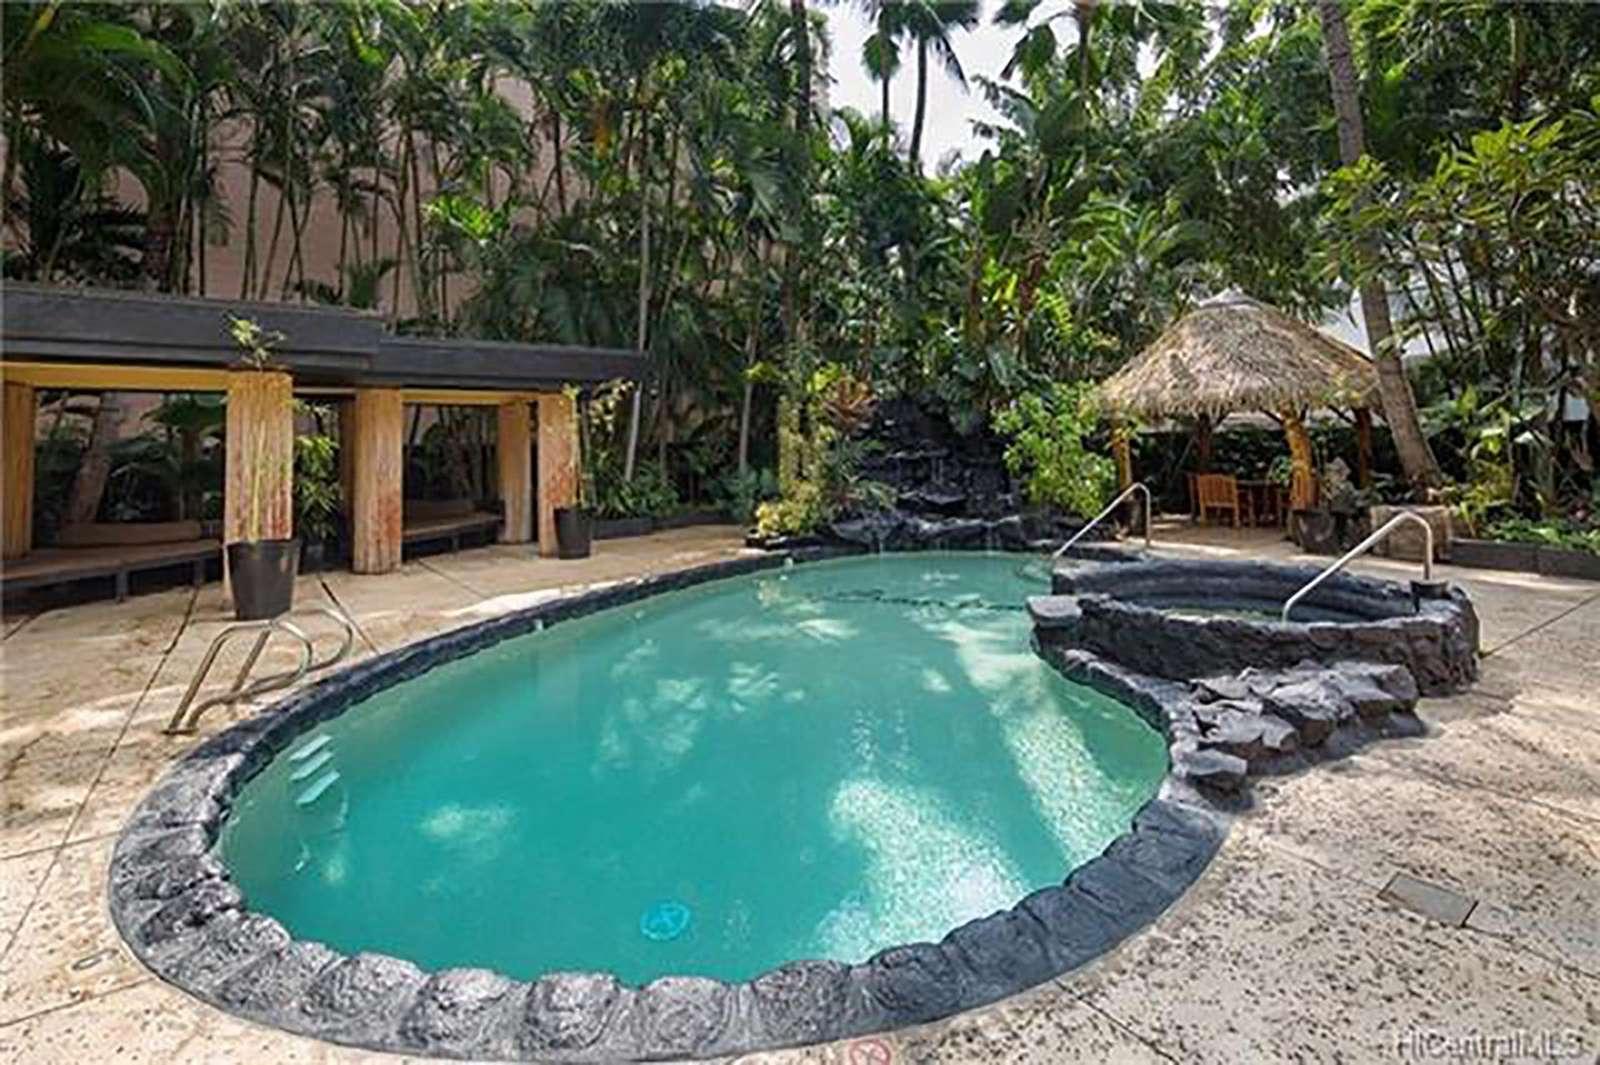 Take a dip in the pool or soak away stress in the hottub.